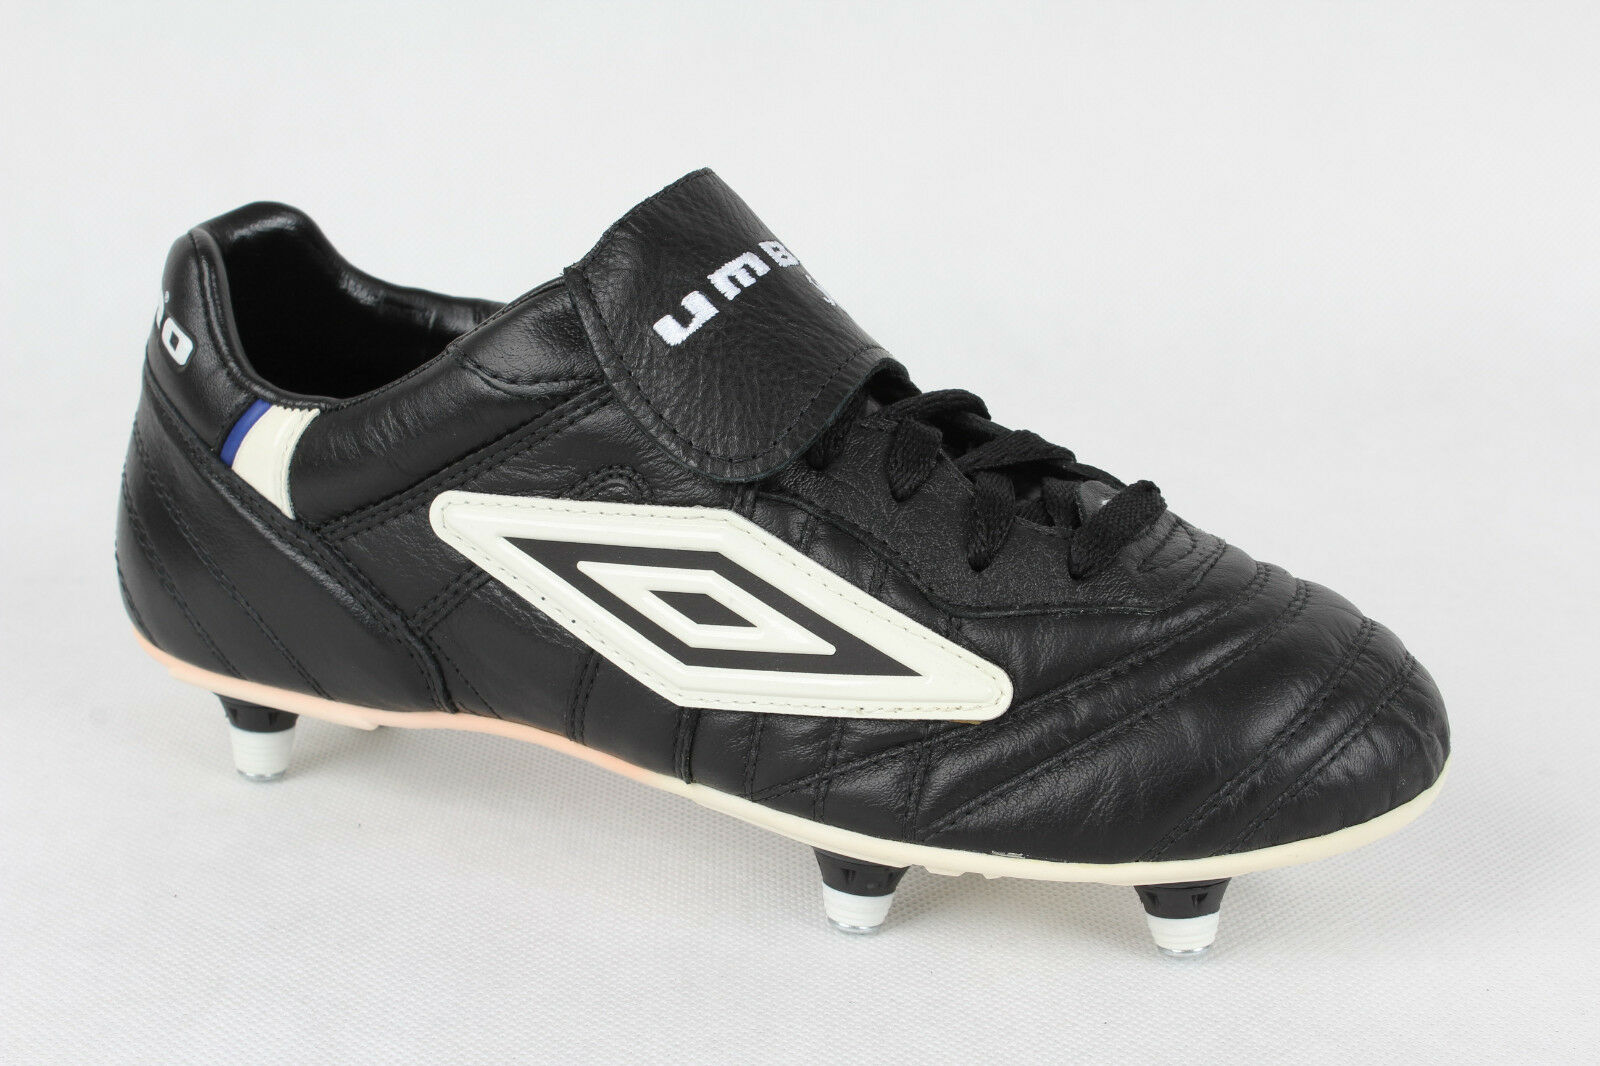 Umbro Speciali A SG Mens Soccer Cleats Football shoes Owen Shearer - UK6 US7